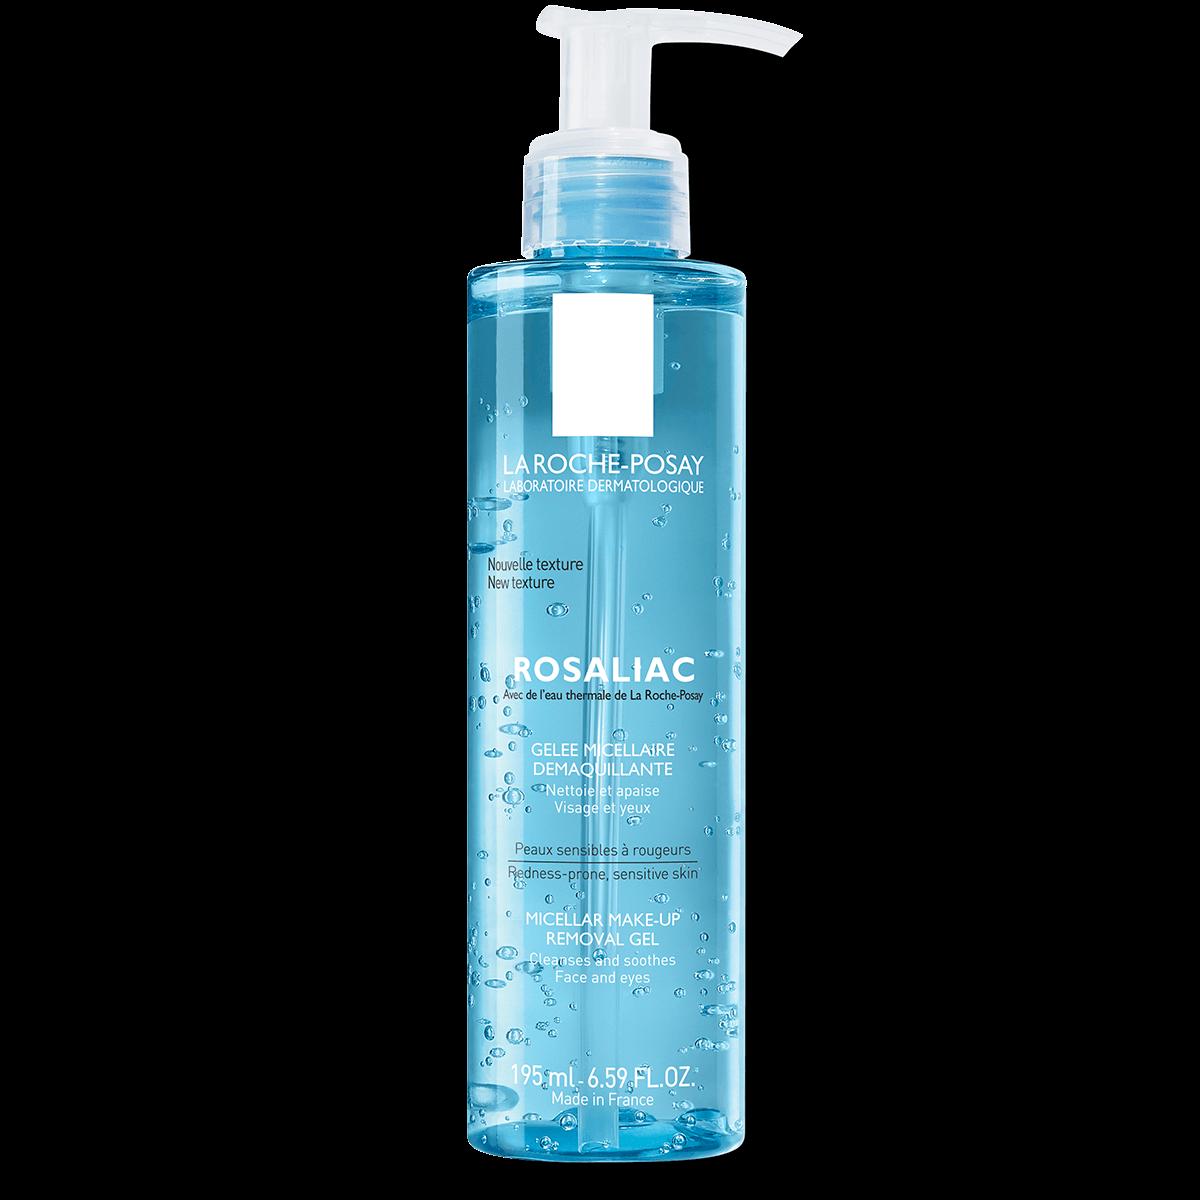 La Roche Posay Produktsida Ansiktsrengöring Rosaliac Make Up Removal Gel